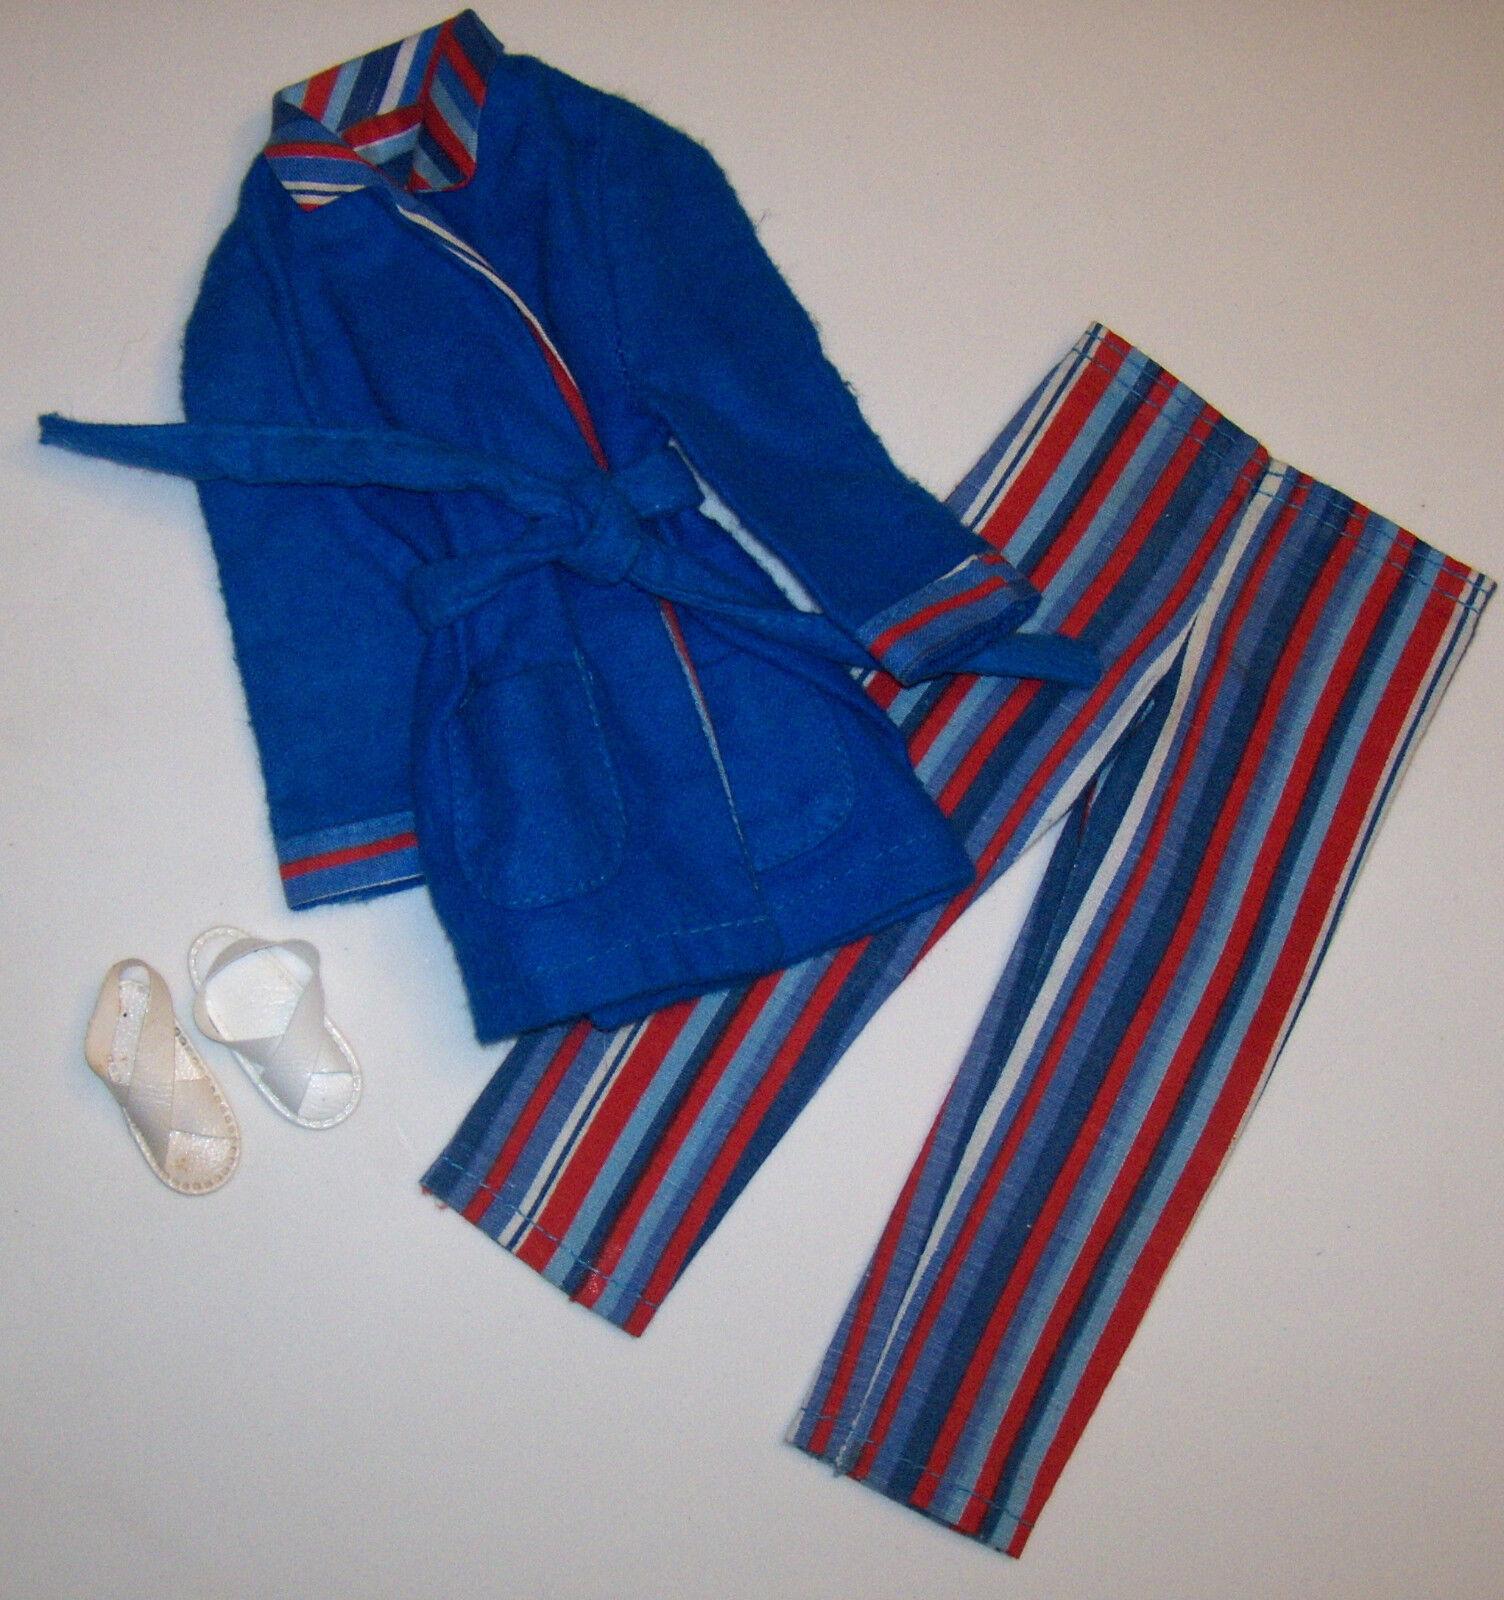 Vintage Ken Wide Awake Strisce Pigiama Pj's Pak  3377 Accappatoio & con Barbie